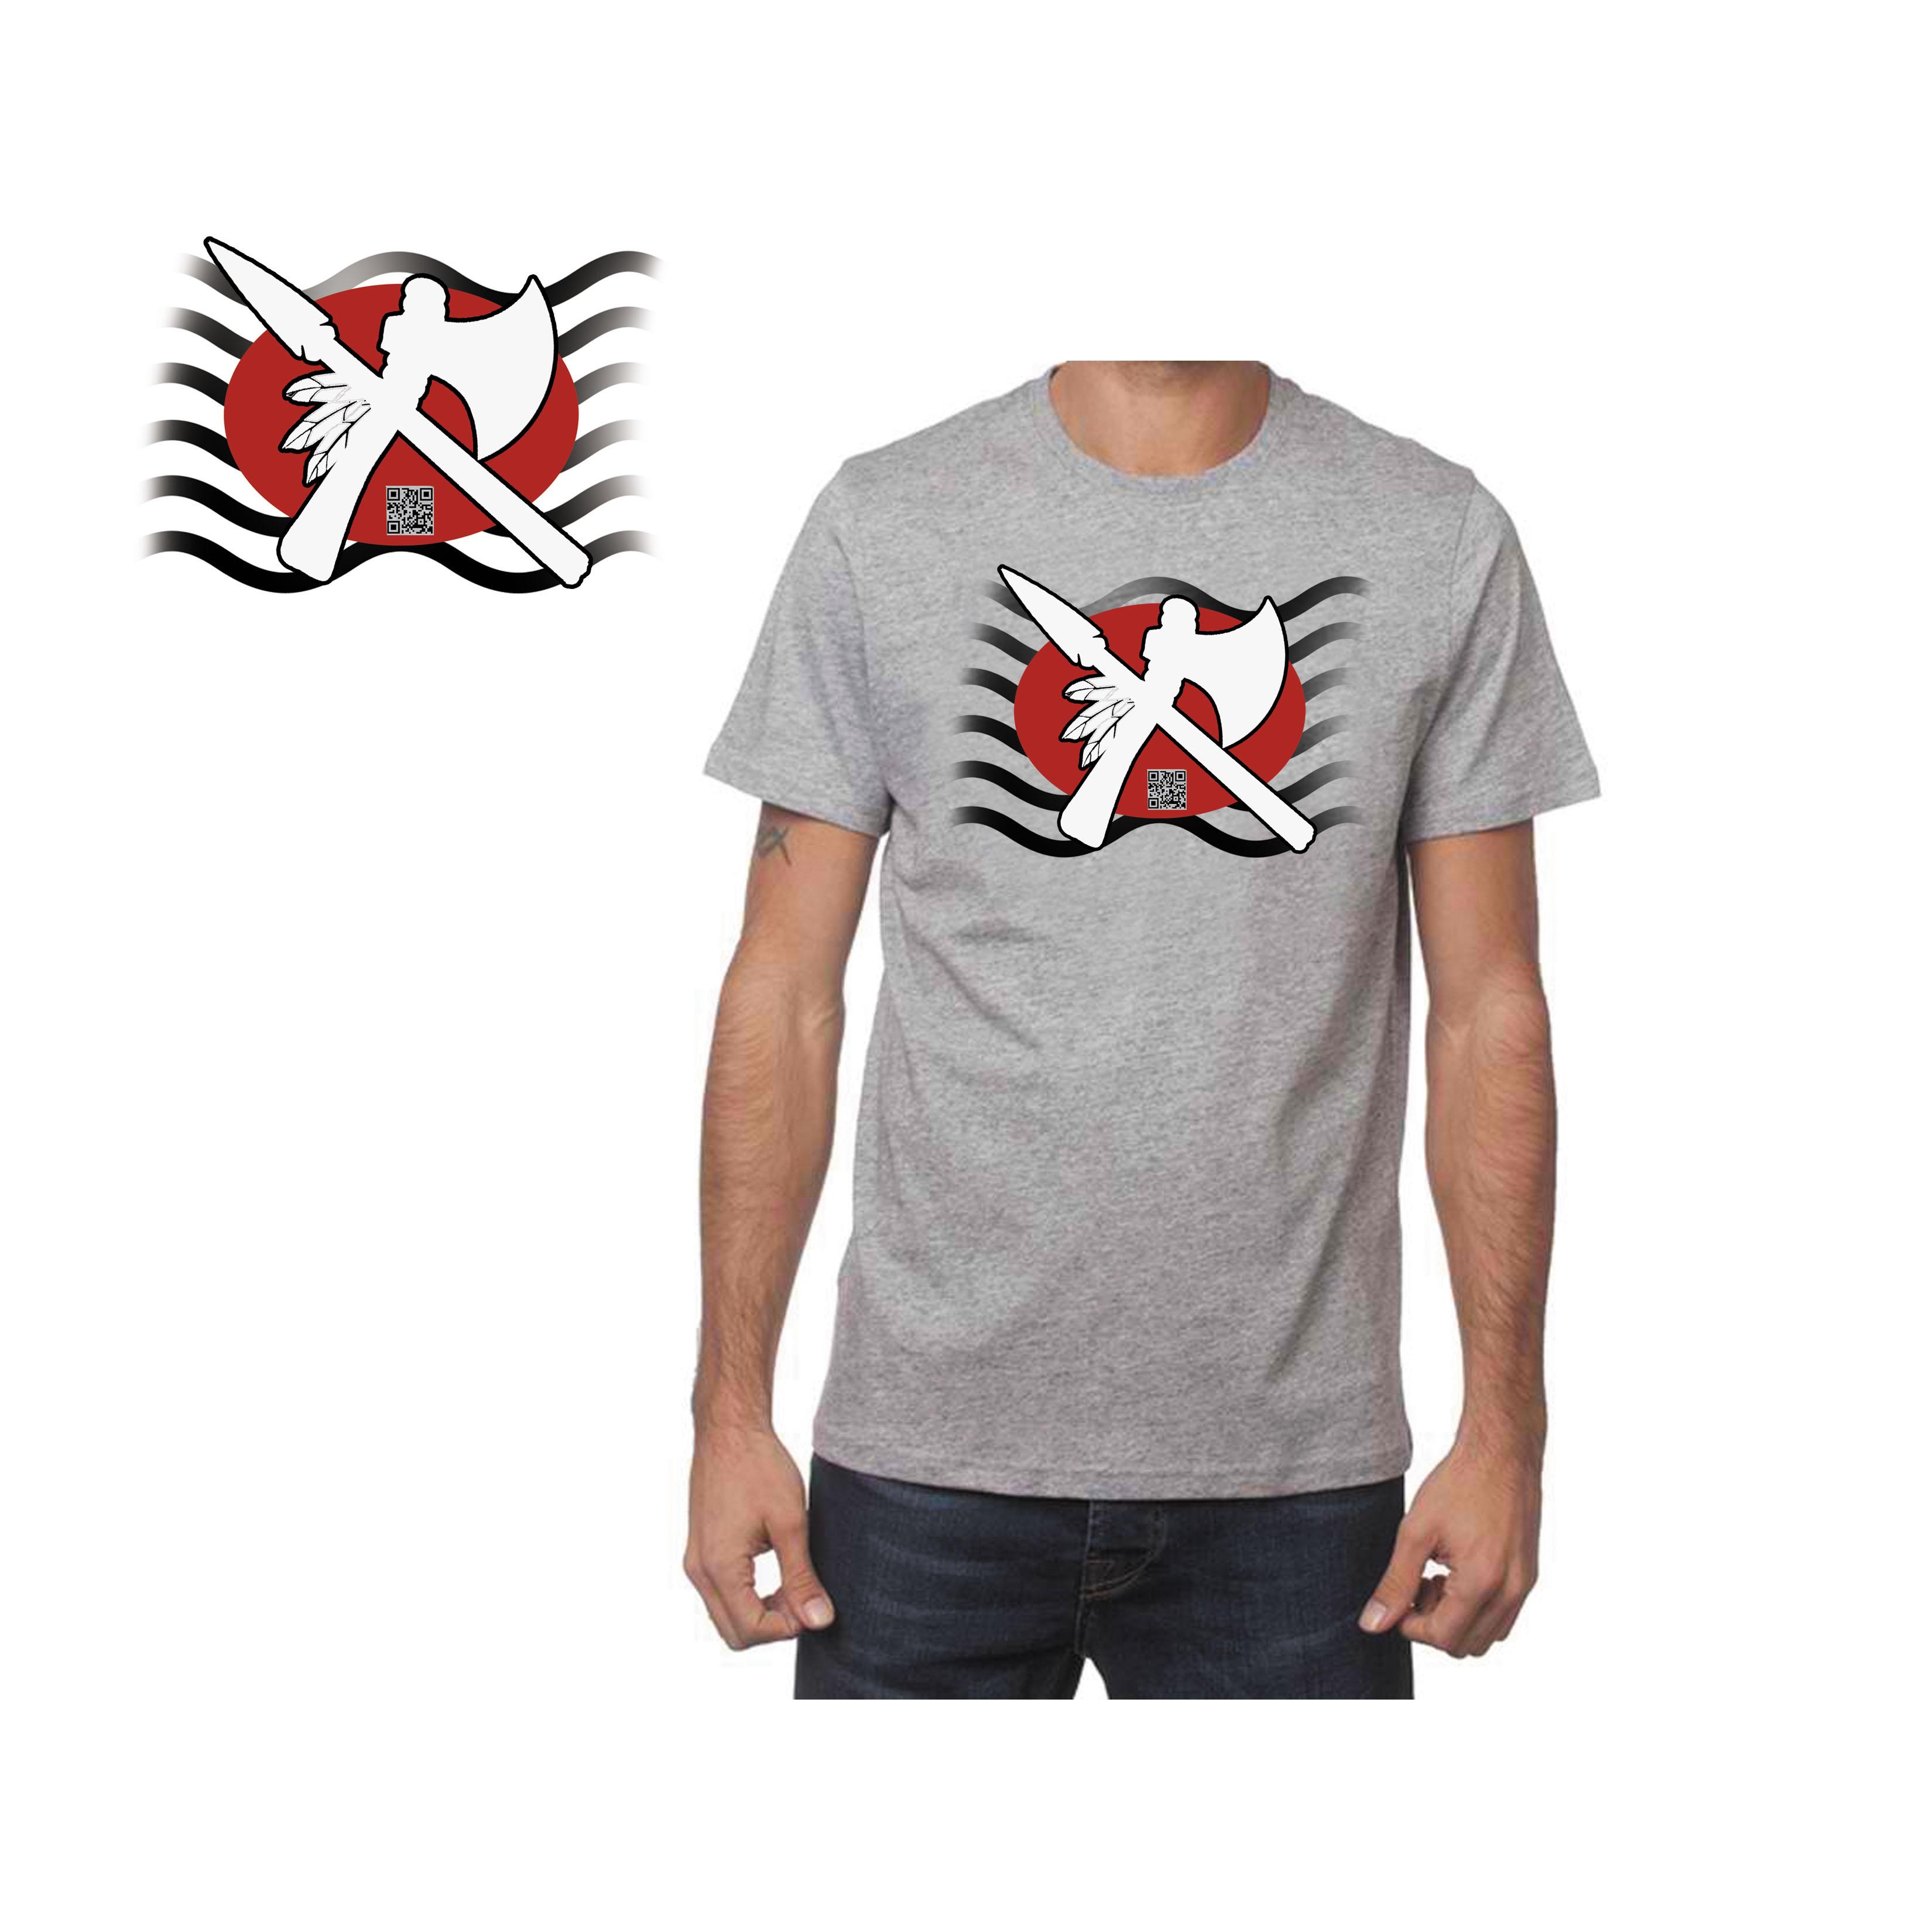 Clothing Design by Alan Esclamado - Entry No. 10 in the Clothing Design Contest Tadow! T-shirt Clothing Design.